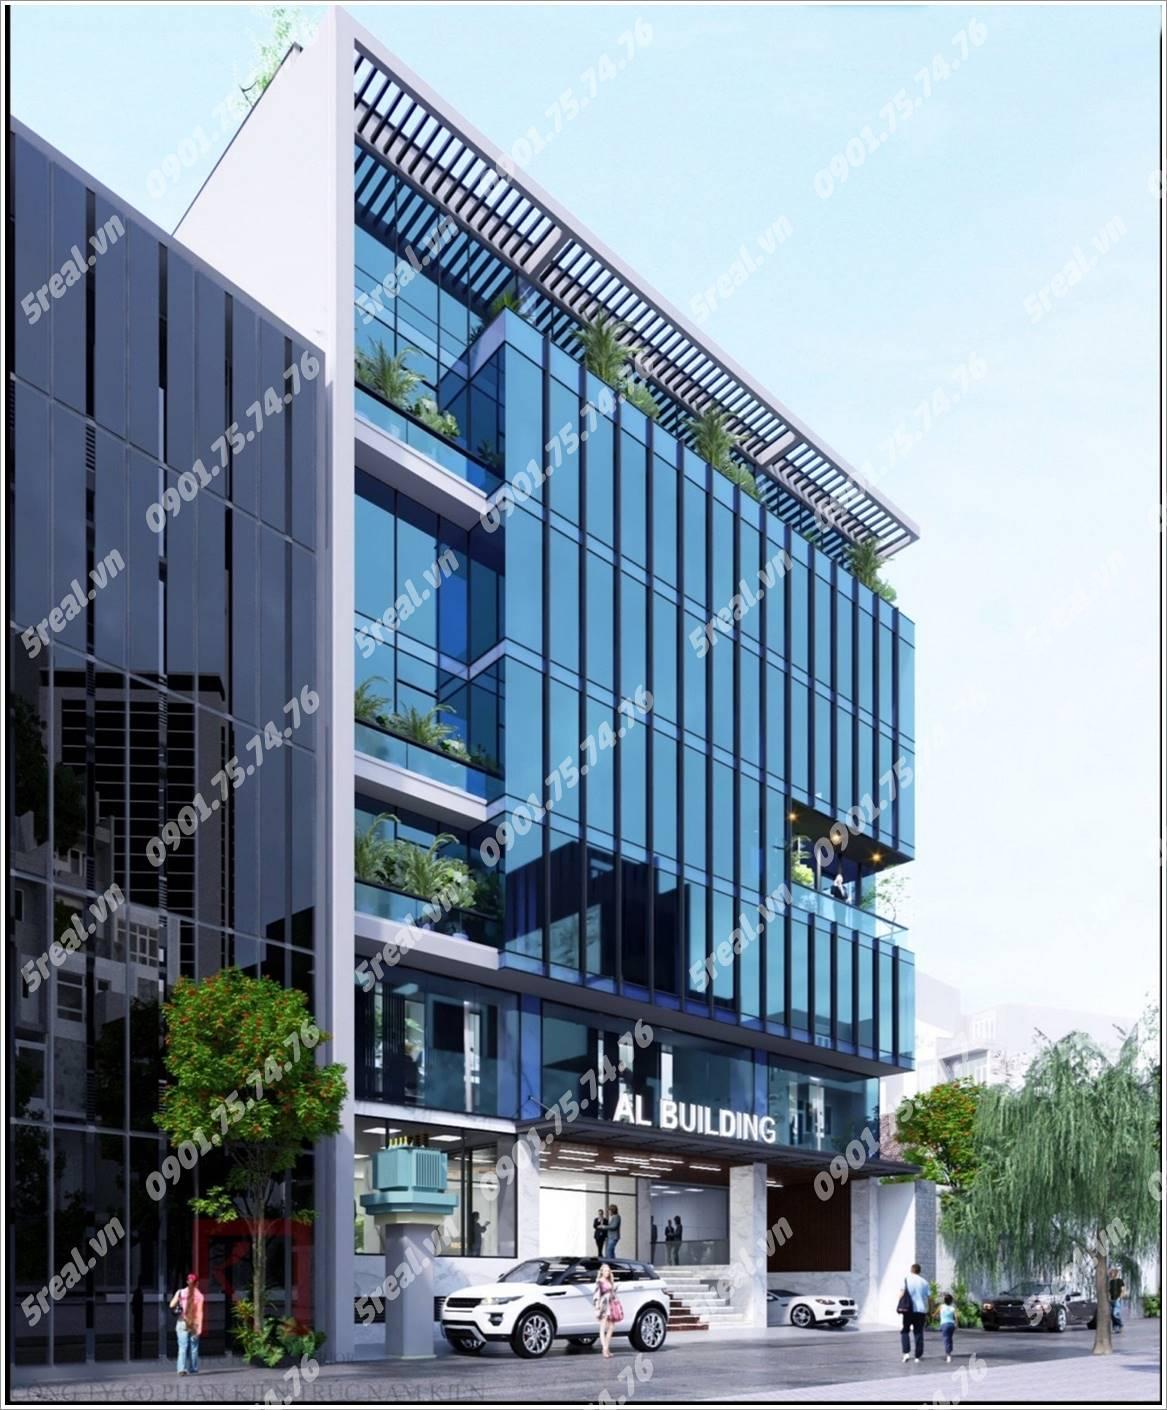 al-building-pho-quang-quan-tan-binh-van-phong-cho-thue-tphcm-5real.vn-01